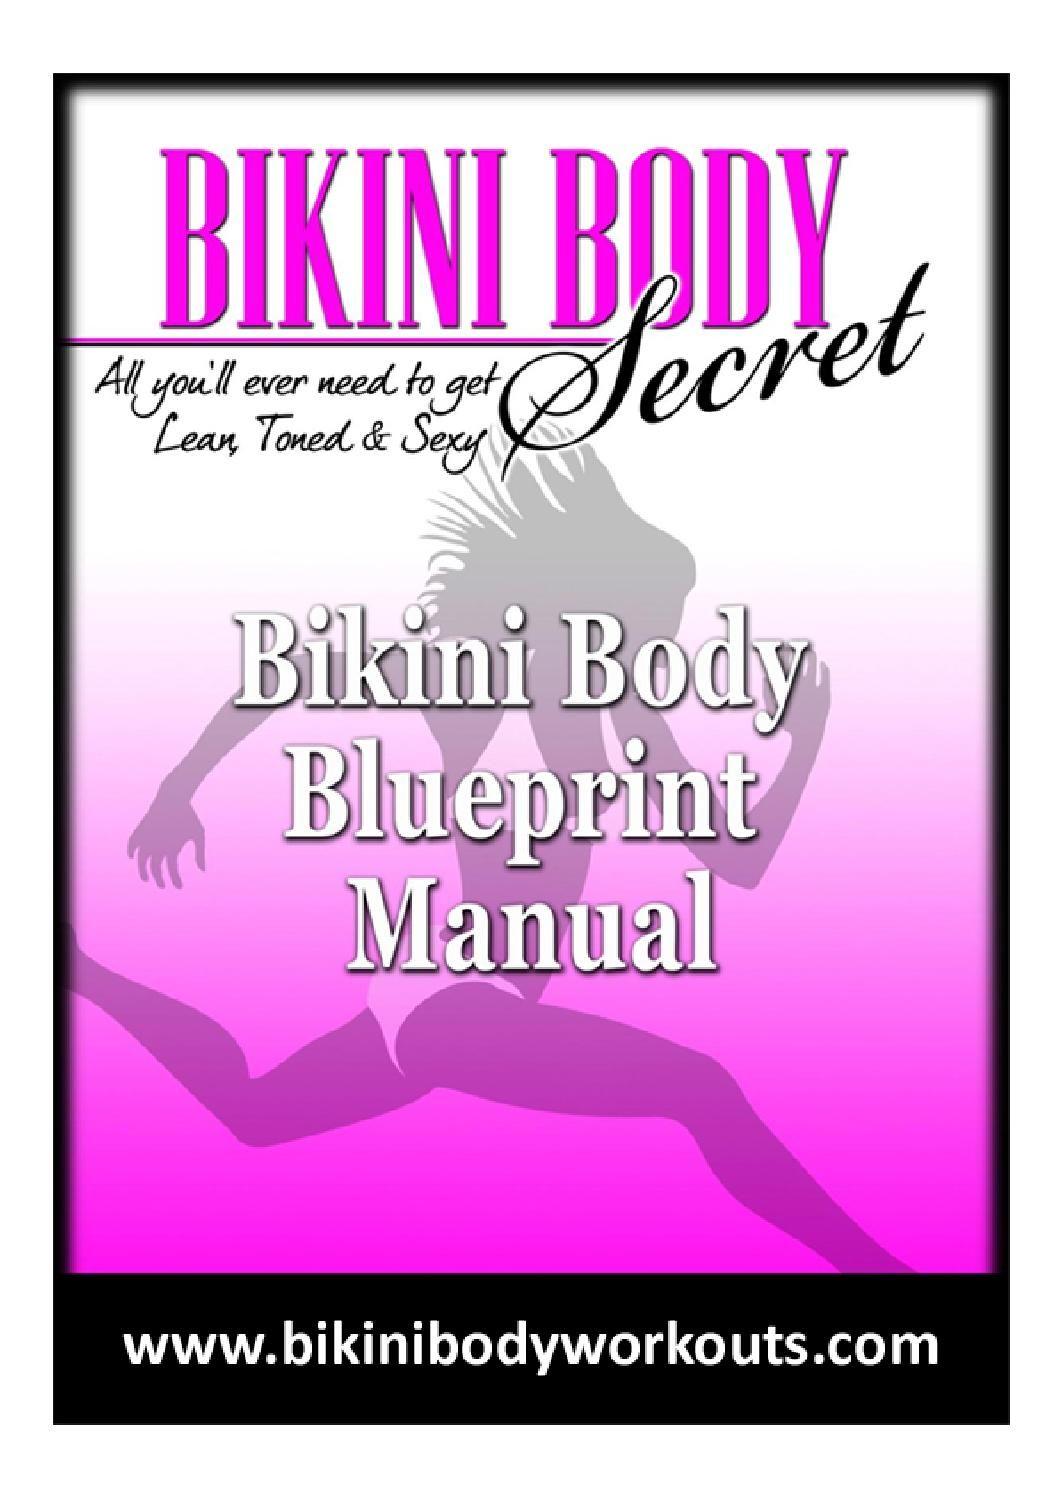 Jen ferruggia bikini body workouts pdf ebook real results real jen ferruggia bikini body workouts pdf book stop reading nonsense reviews get malvernweather Image collections